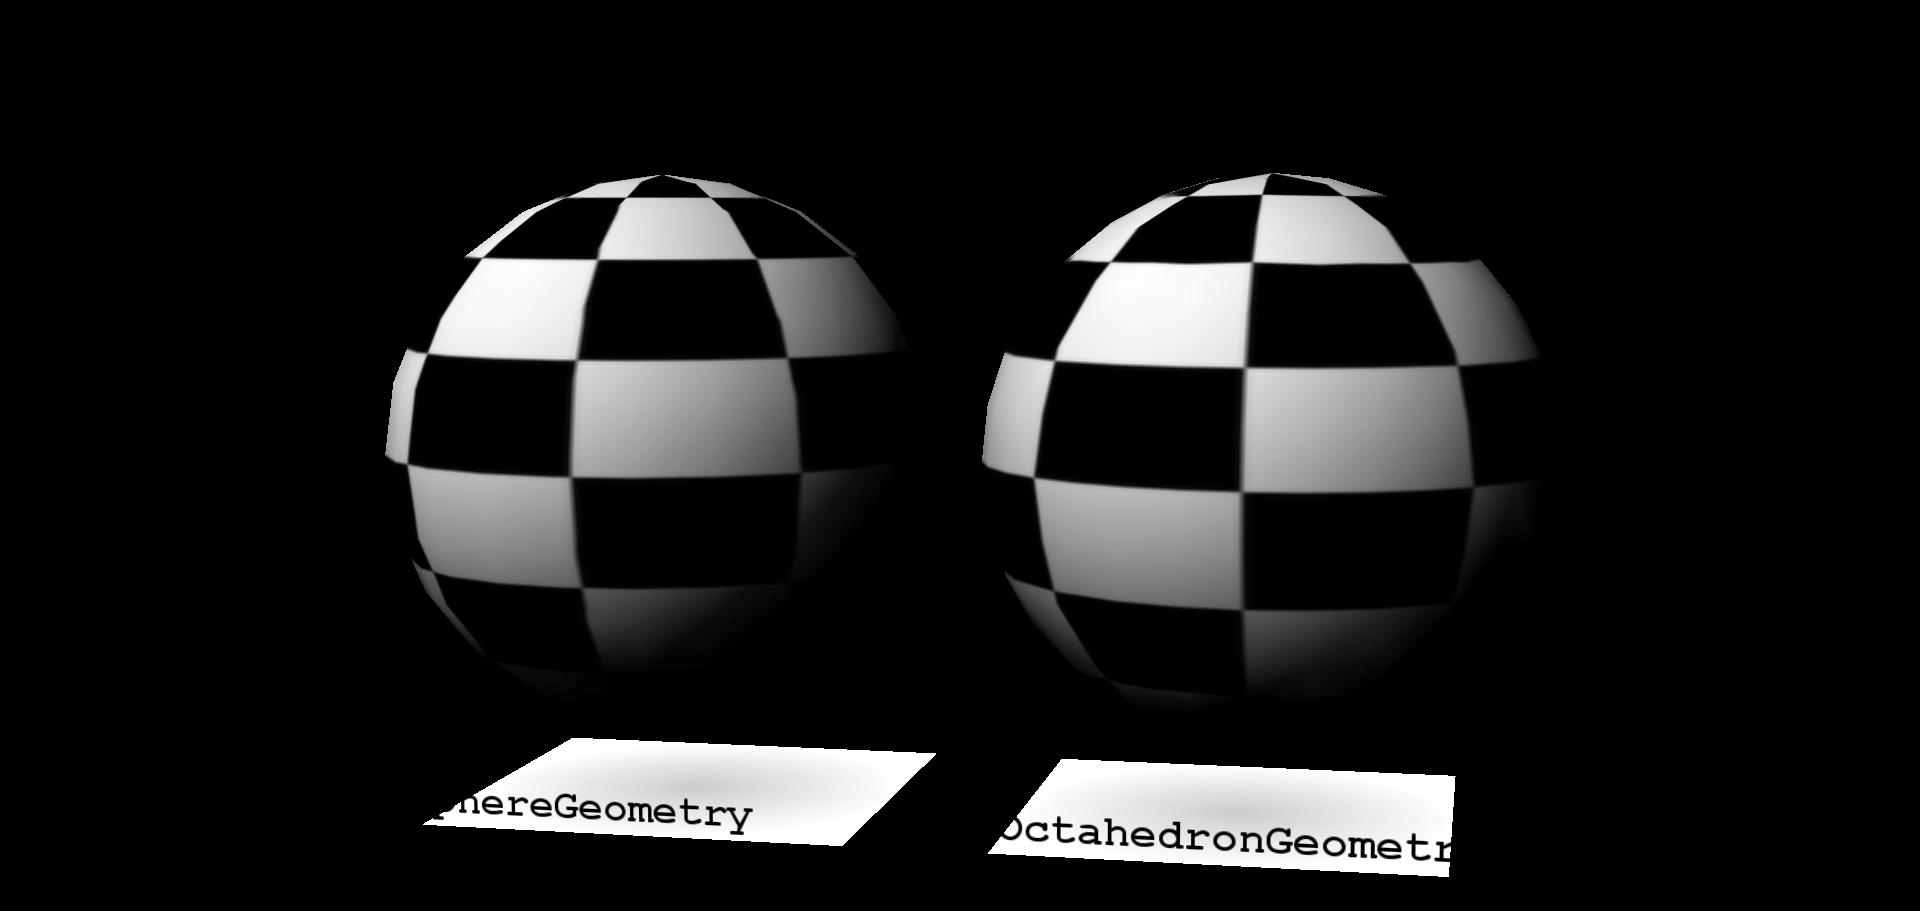 three dimensional web design